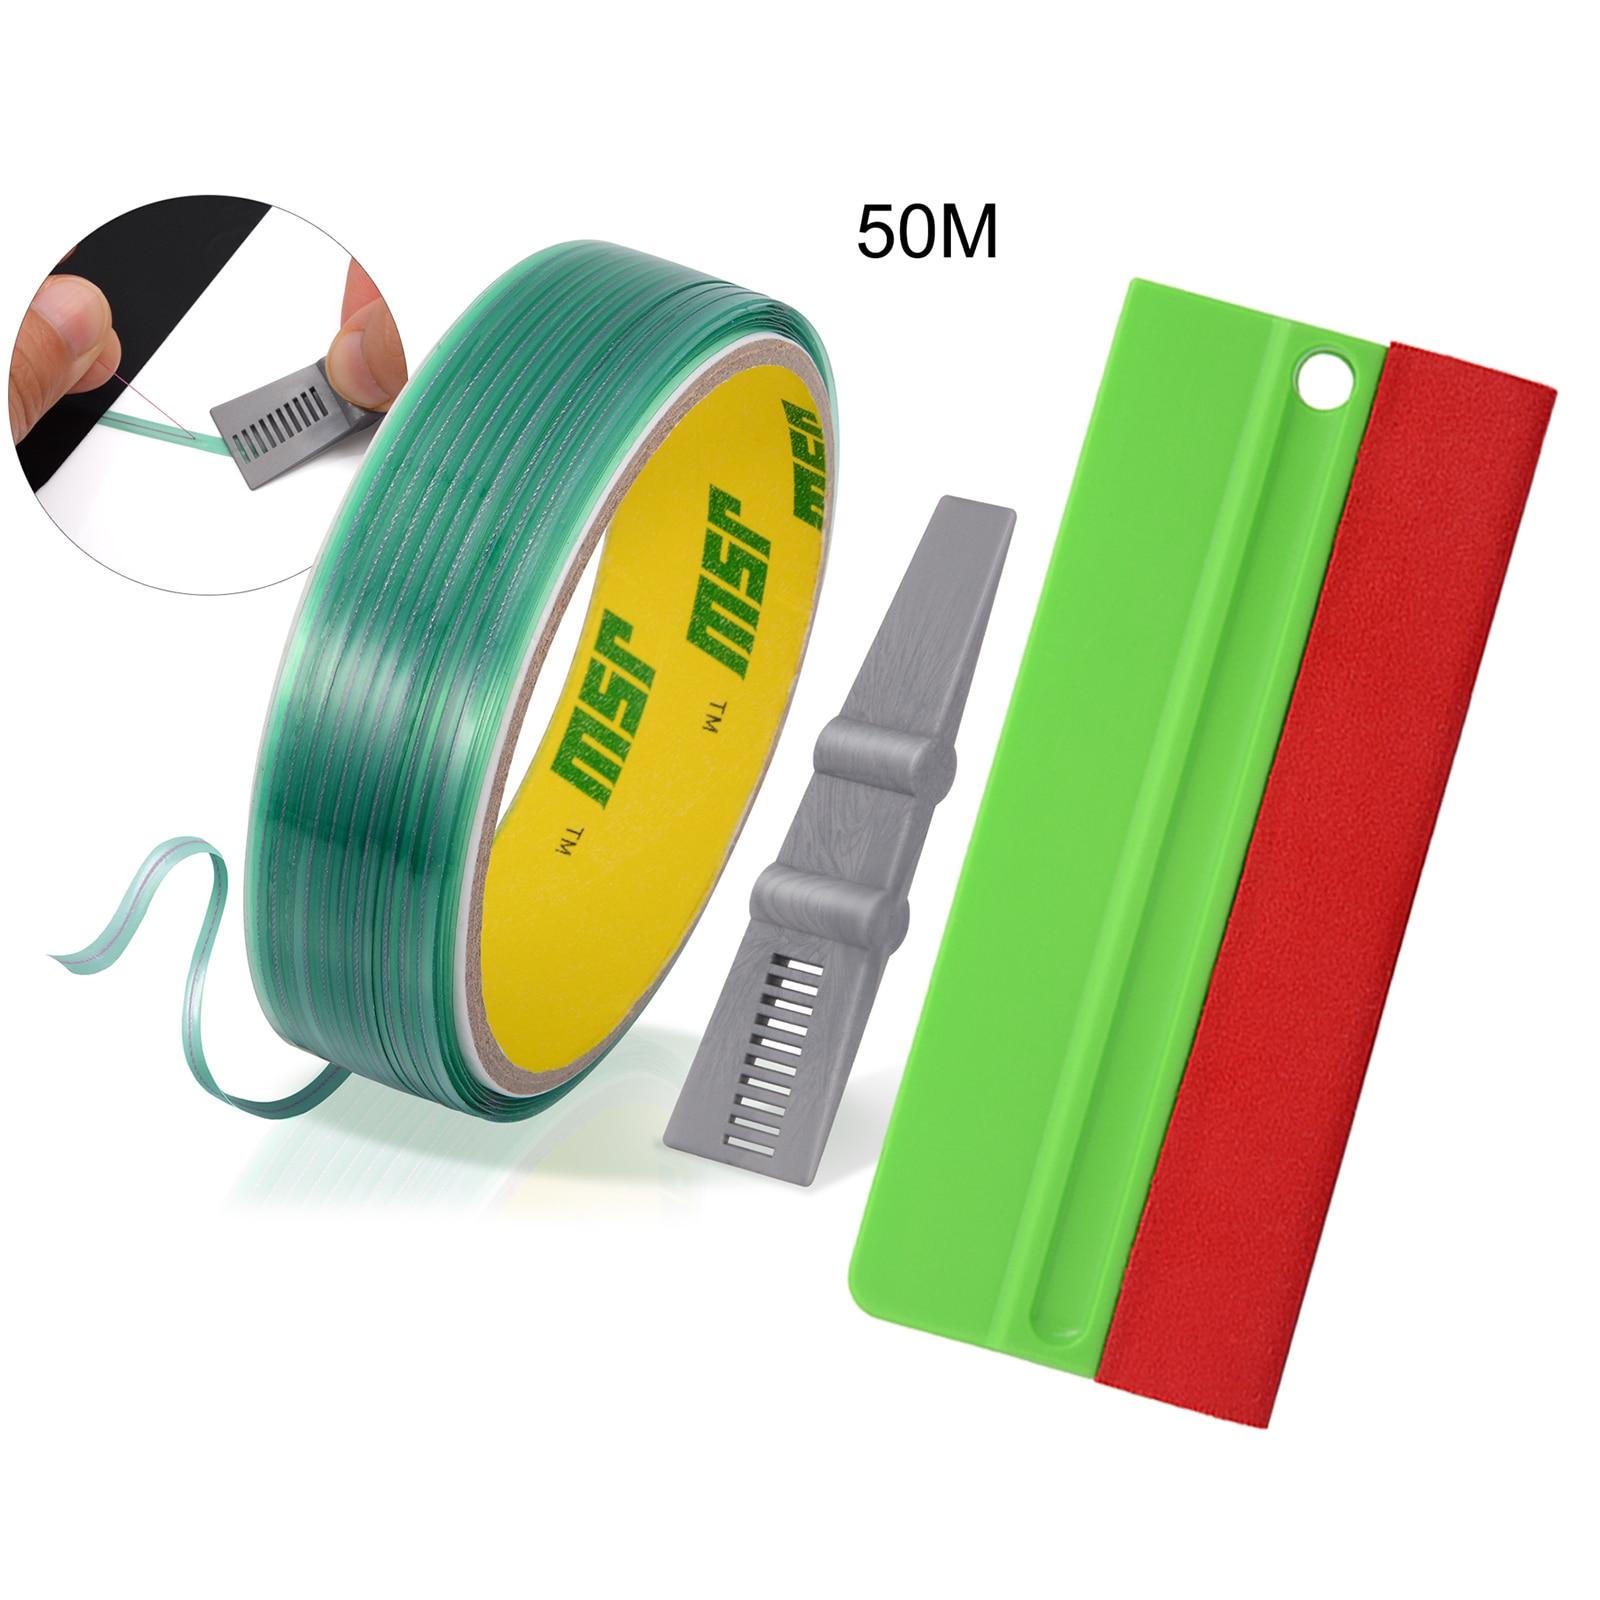 EHDIS Wrapping Vinyl Film Cutting Tape Carbon Fiber Wrap Scraper Squeegee Knifeless Design Line Cutter Car Styling Tint Tool Set